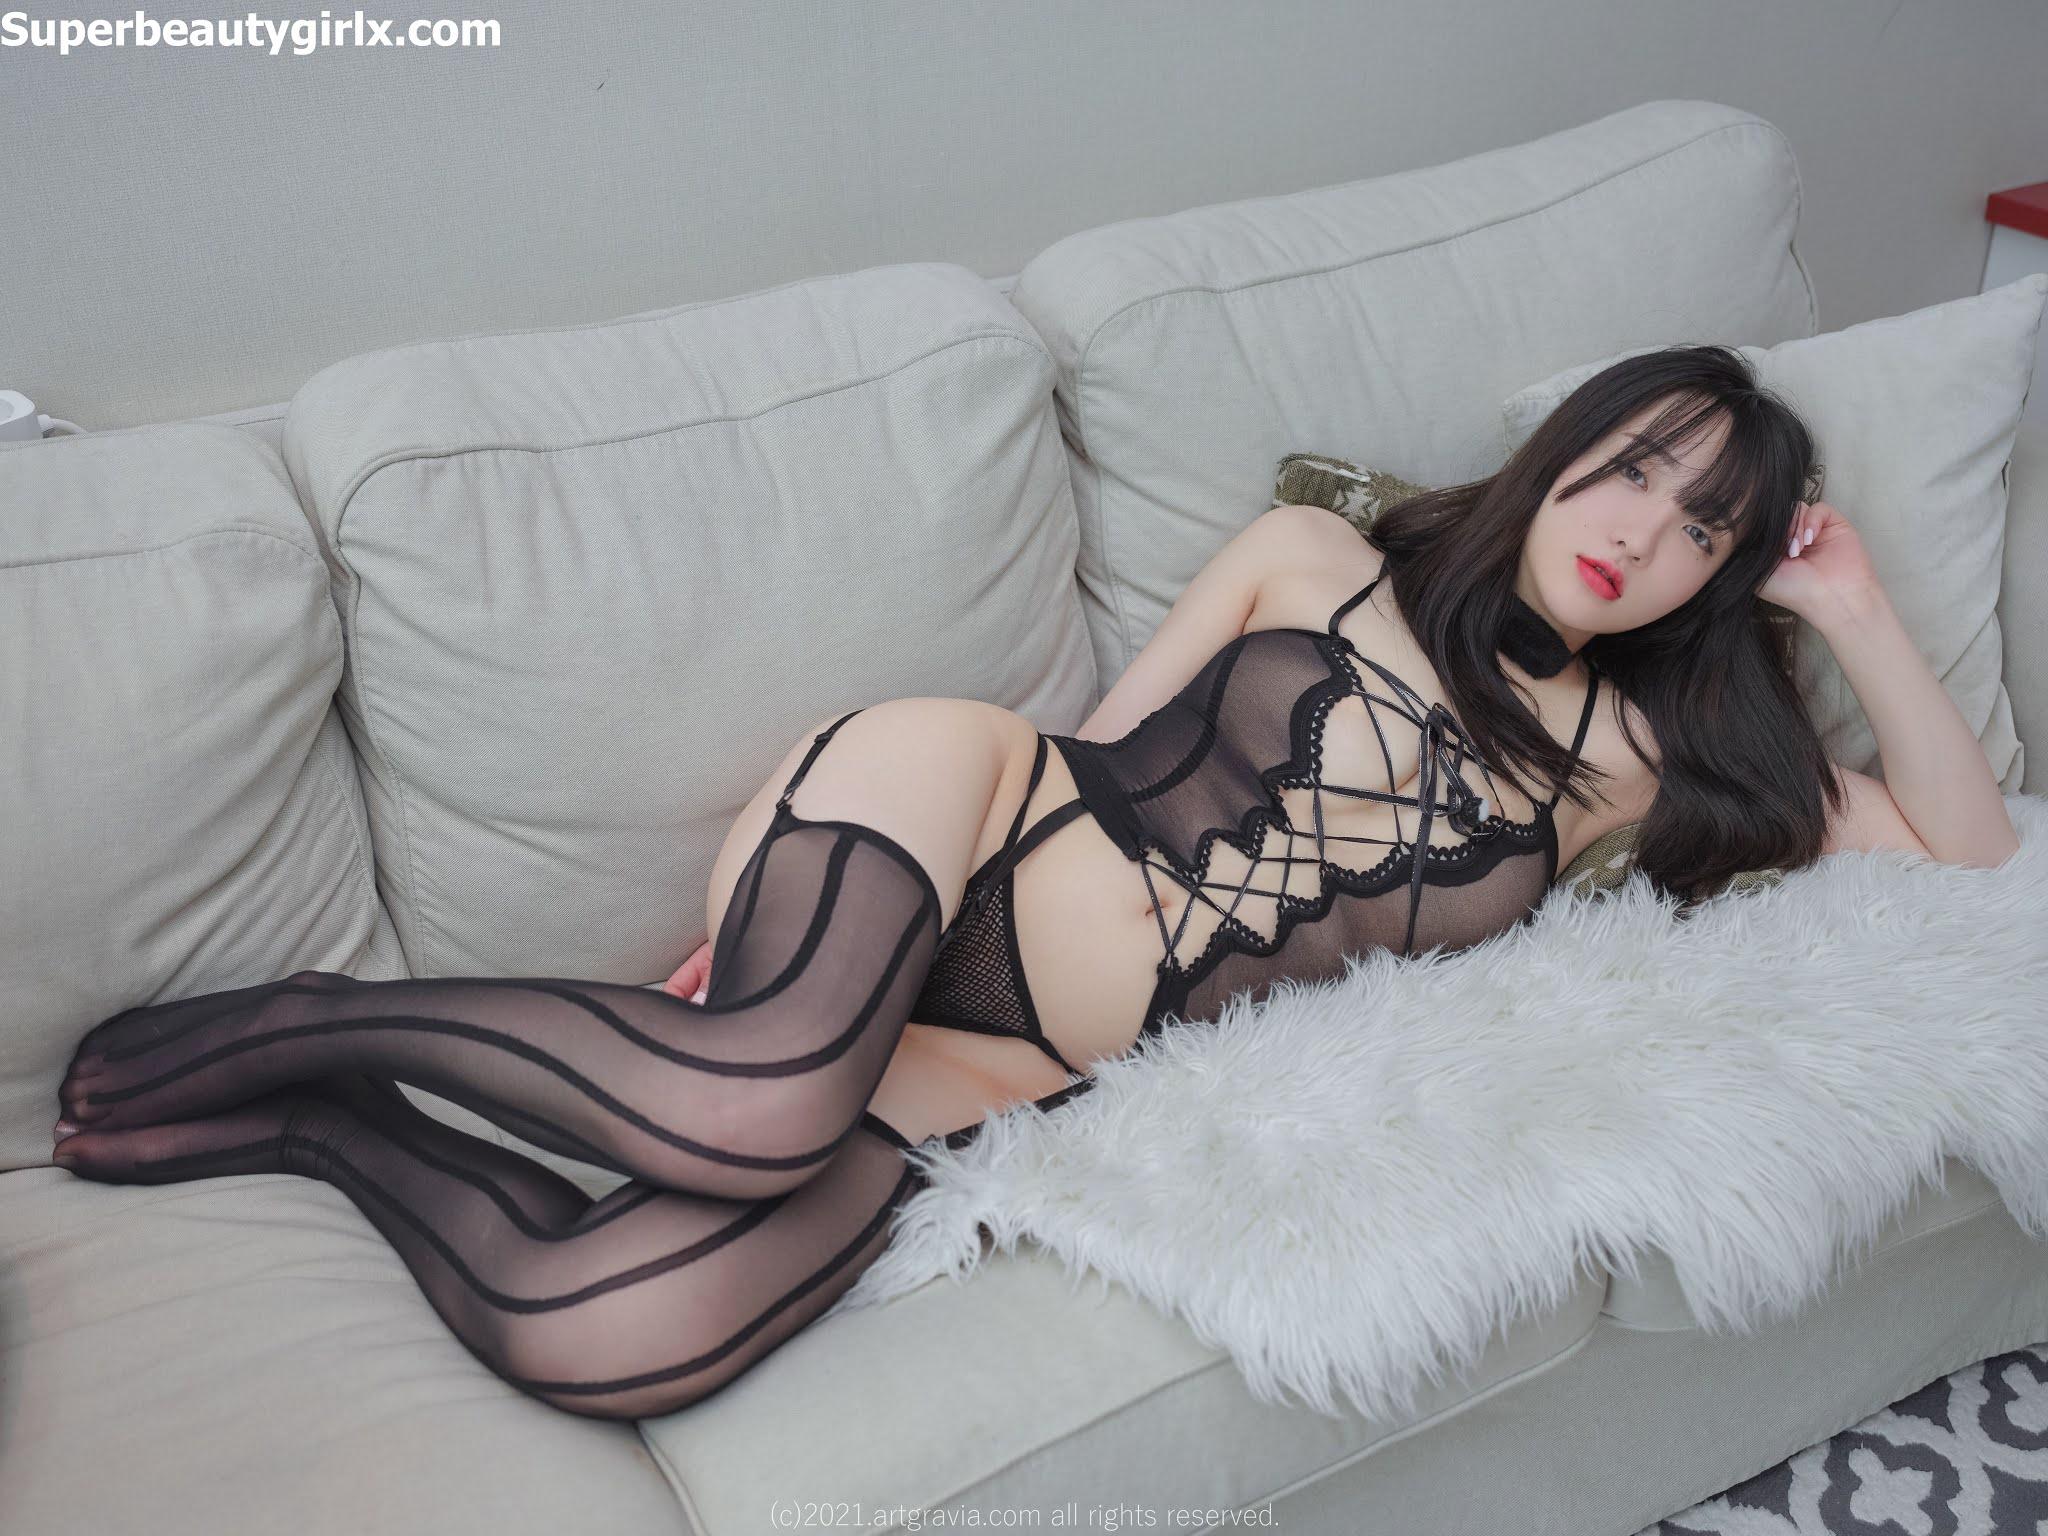 ArtGravia-Vol.277-Son-Ye-Eun-Superbeautygirlx.com